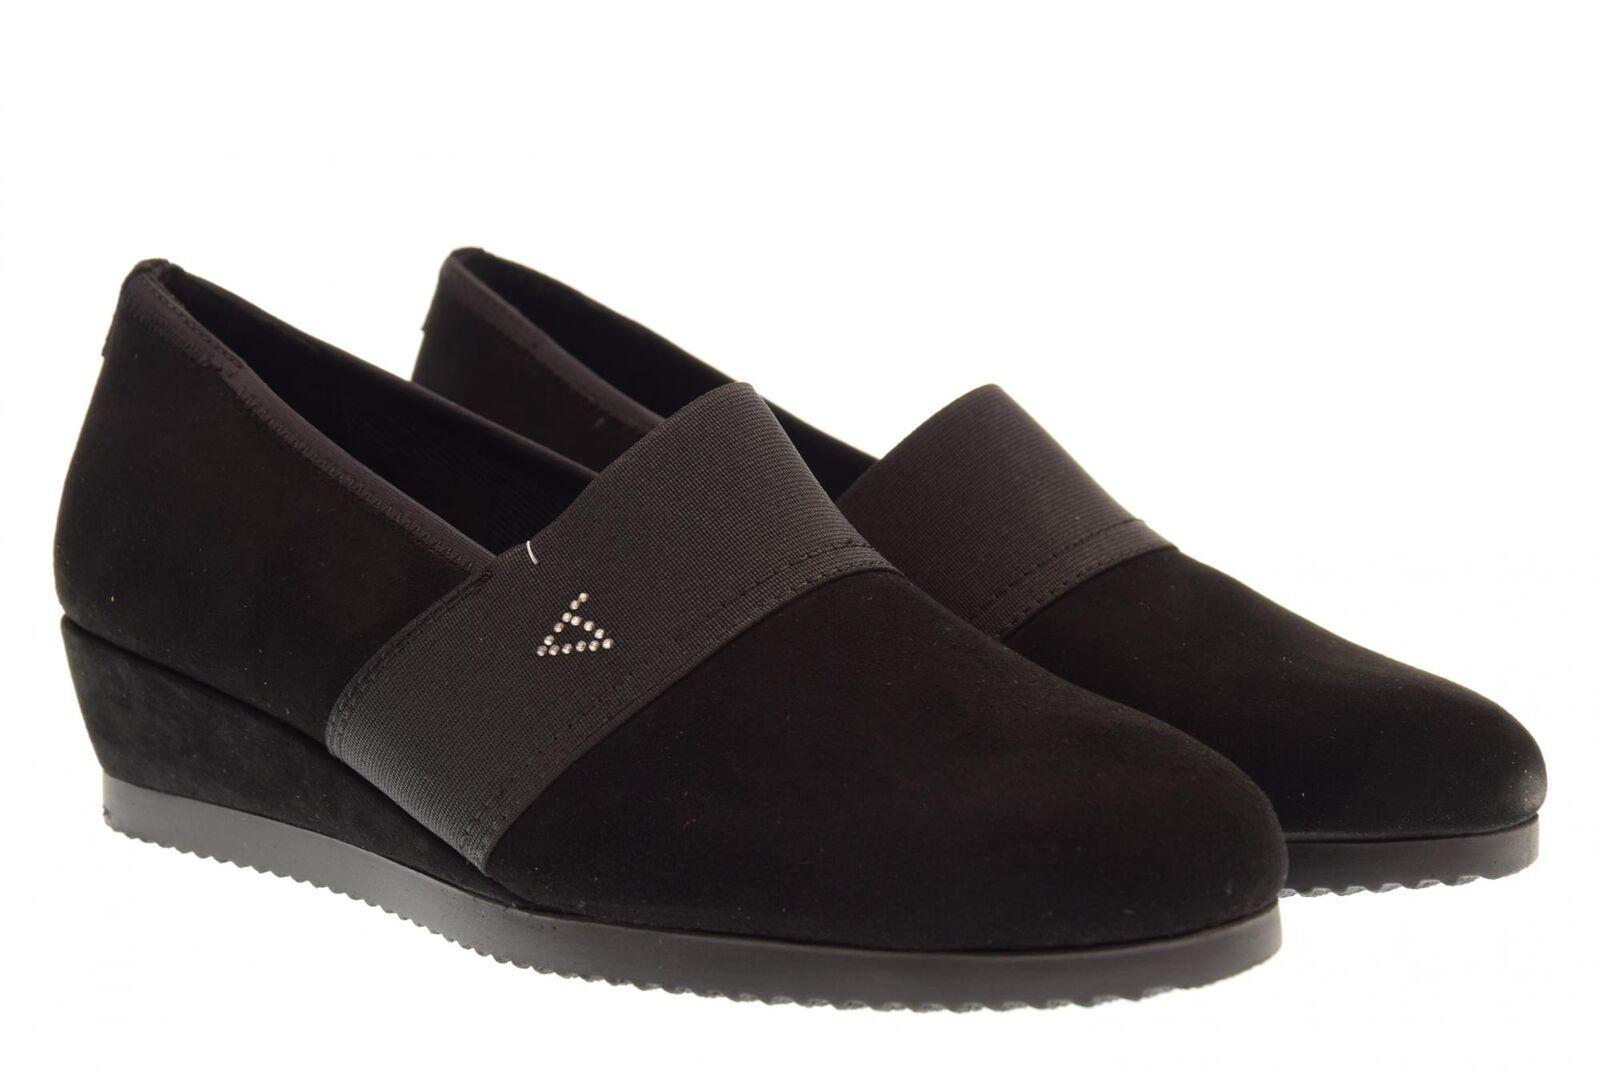 Valleverde A18us  scarpe donna calzature accorata 36301  vendita calda online